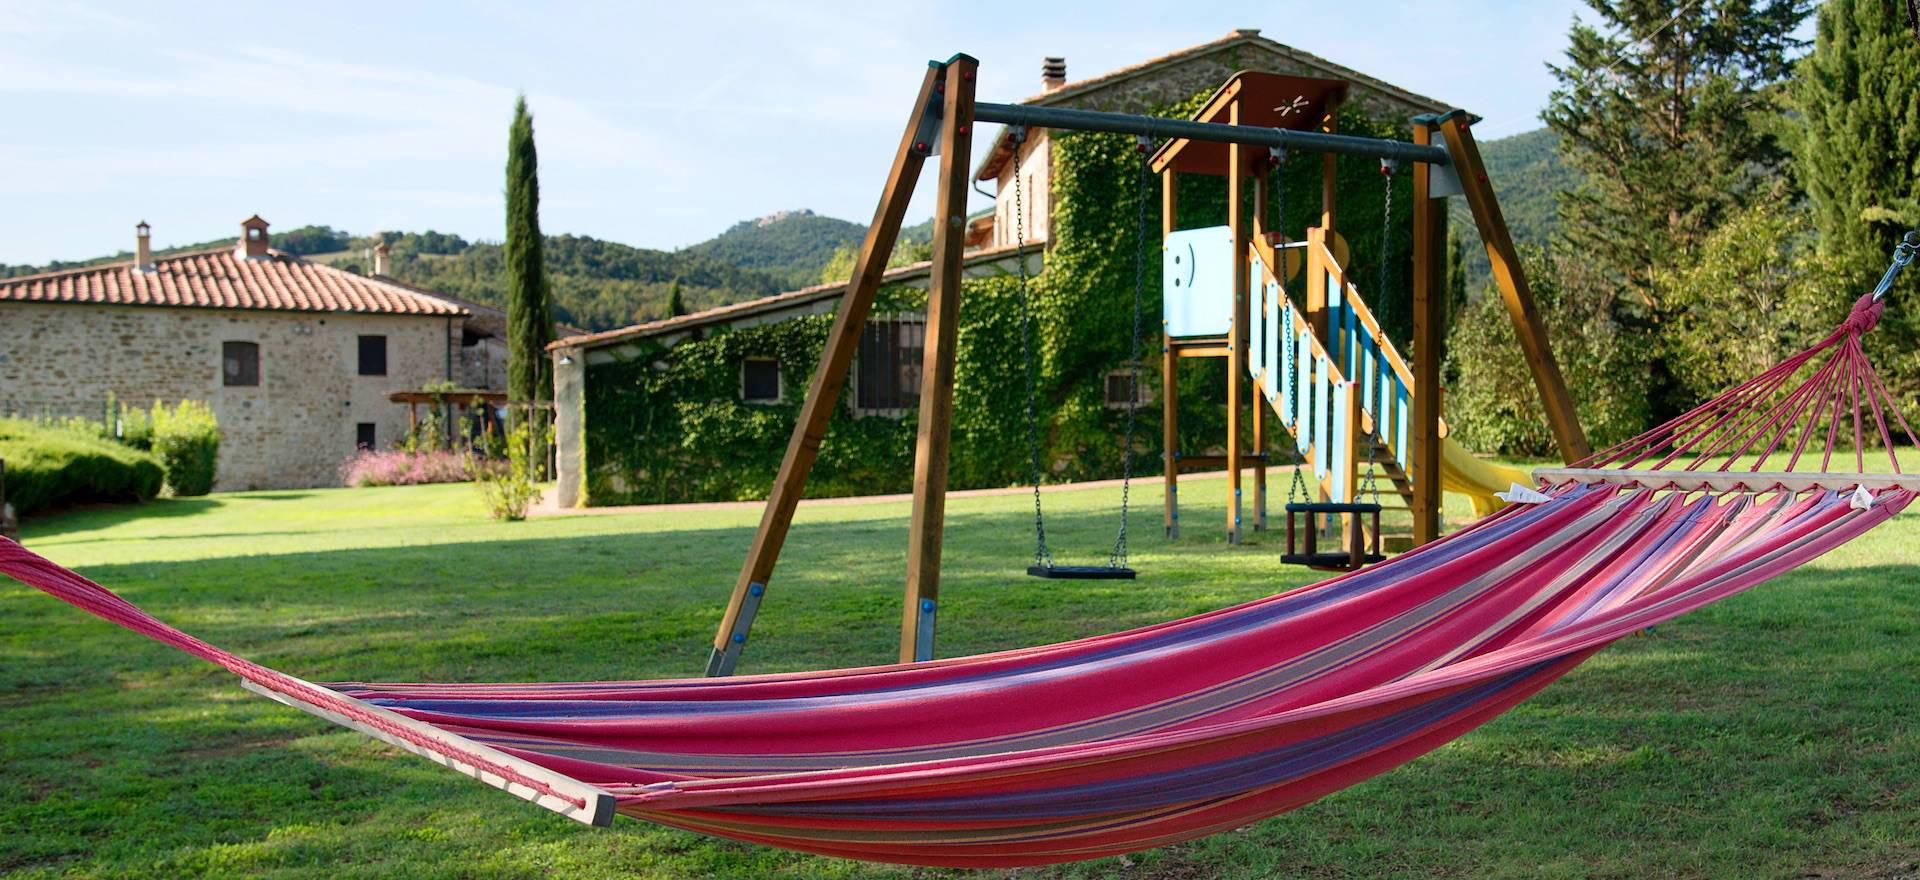 Agriturismo Toscane Agriturismo Toscane met smaakvol ingerichte appartementen